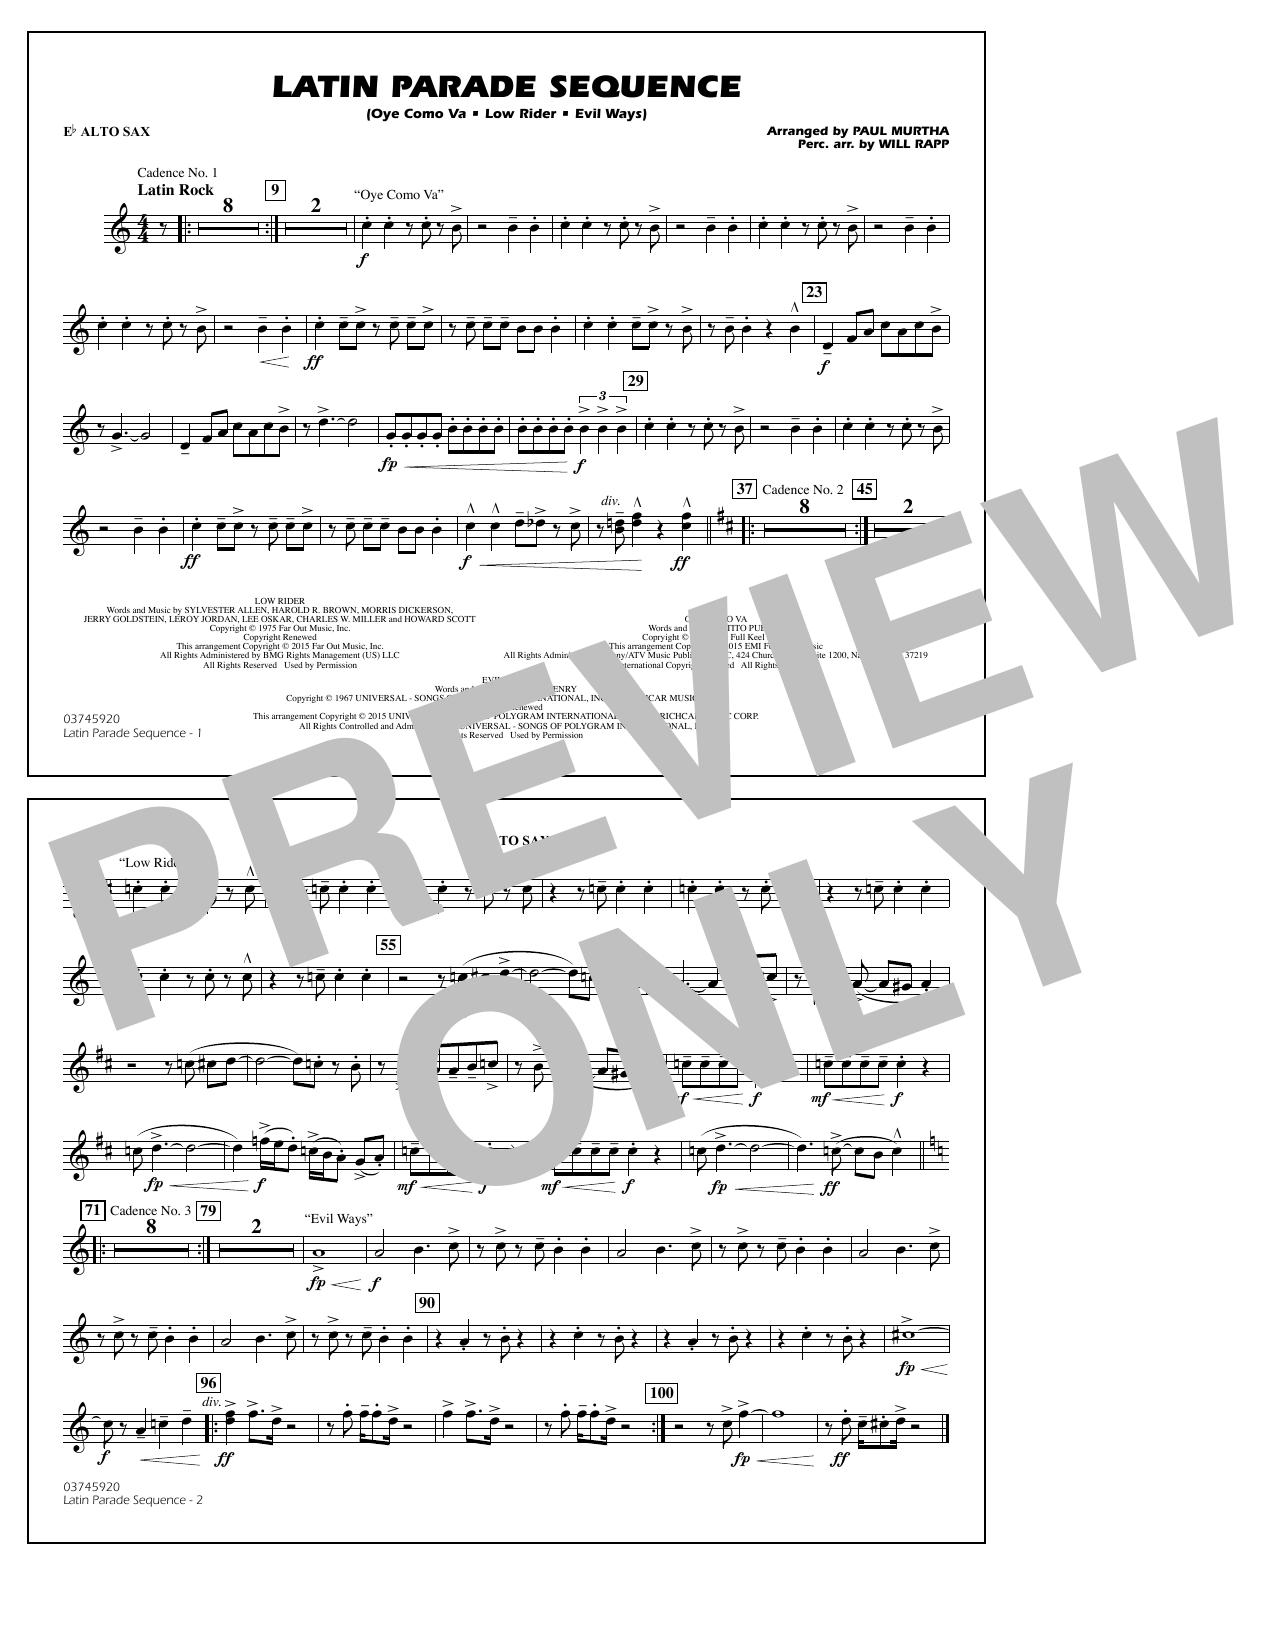 Paul Murtha Latin Parade Sequence - Eb Alto Sax sheet music notes and chords